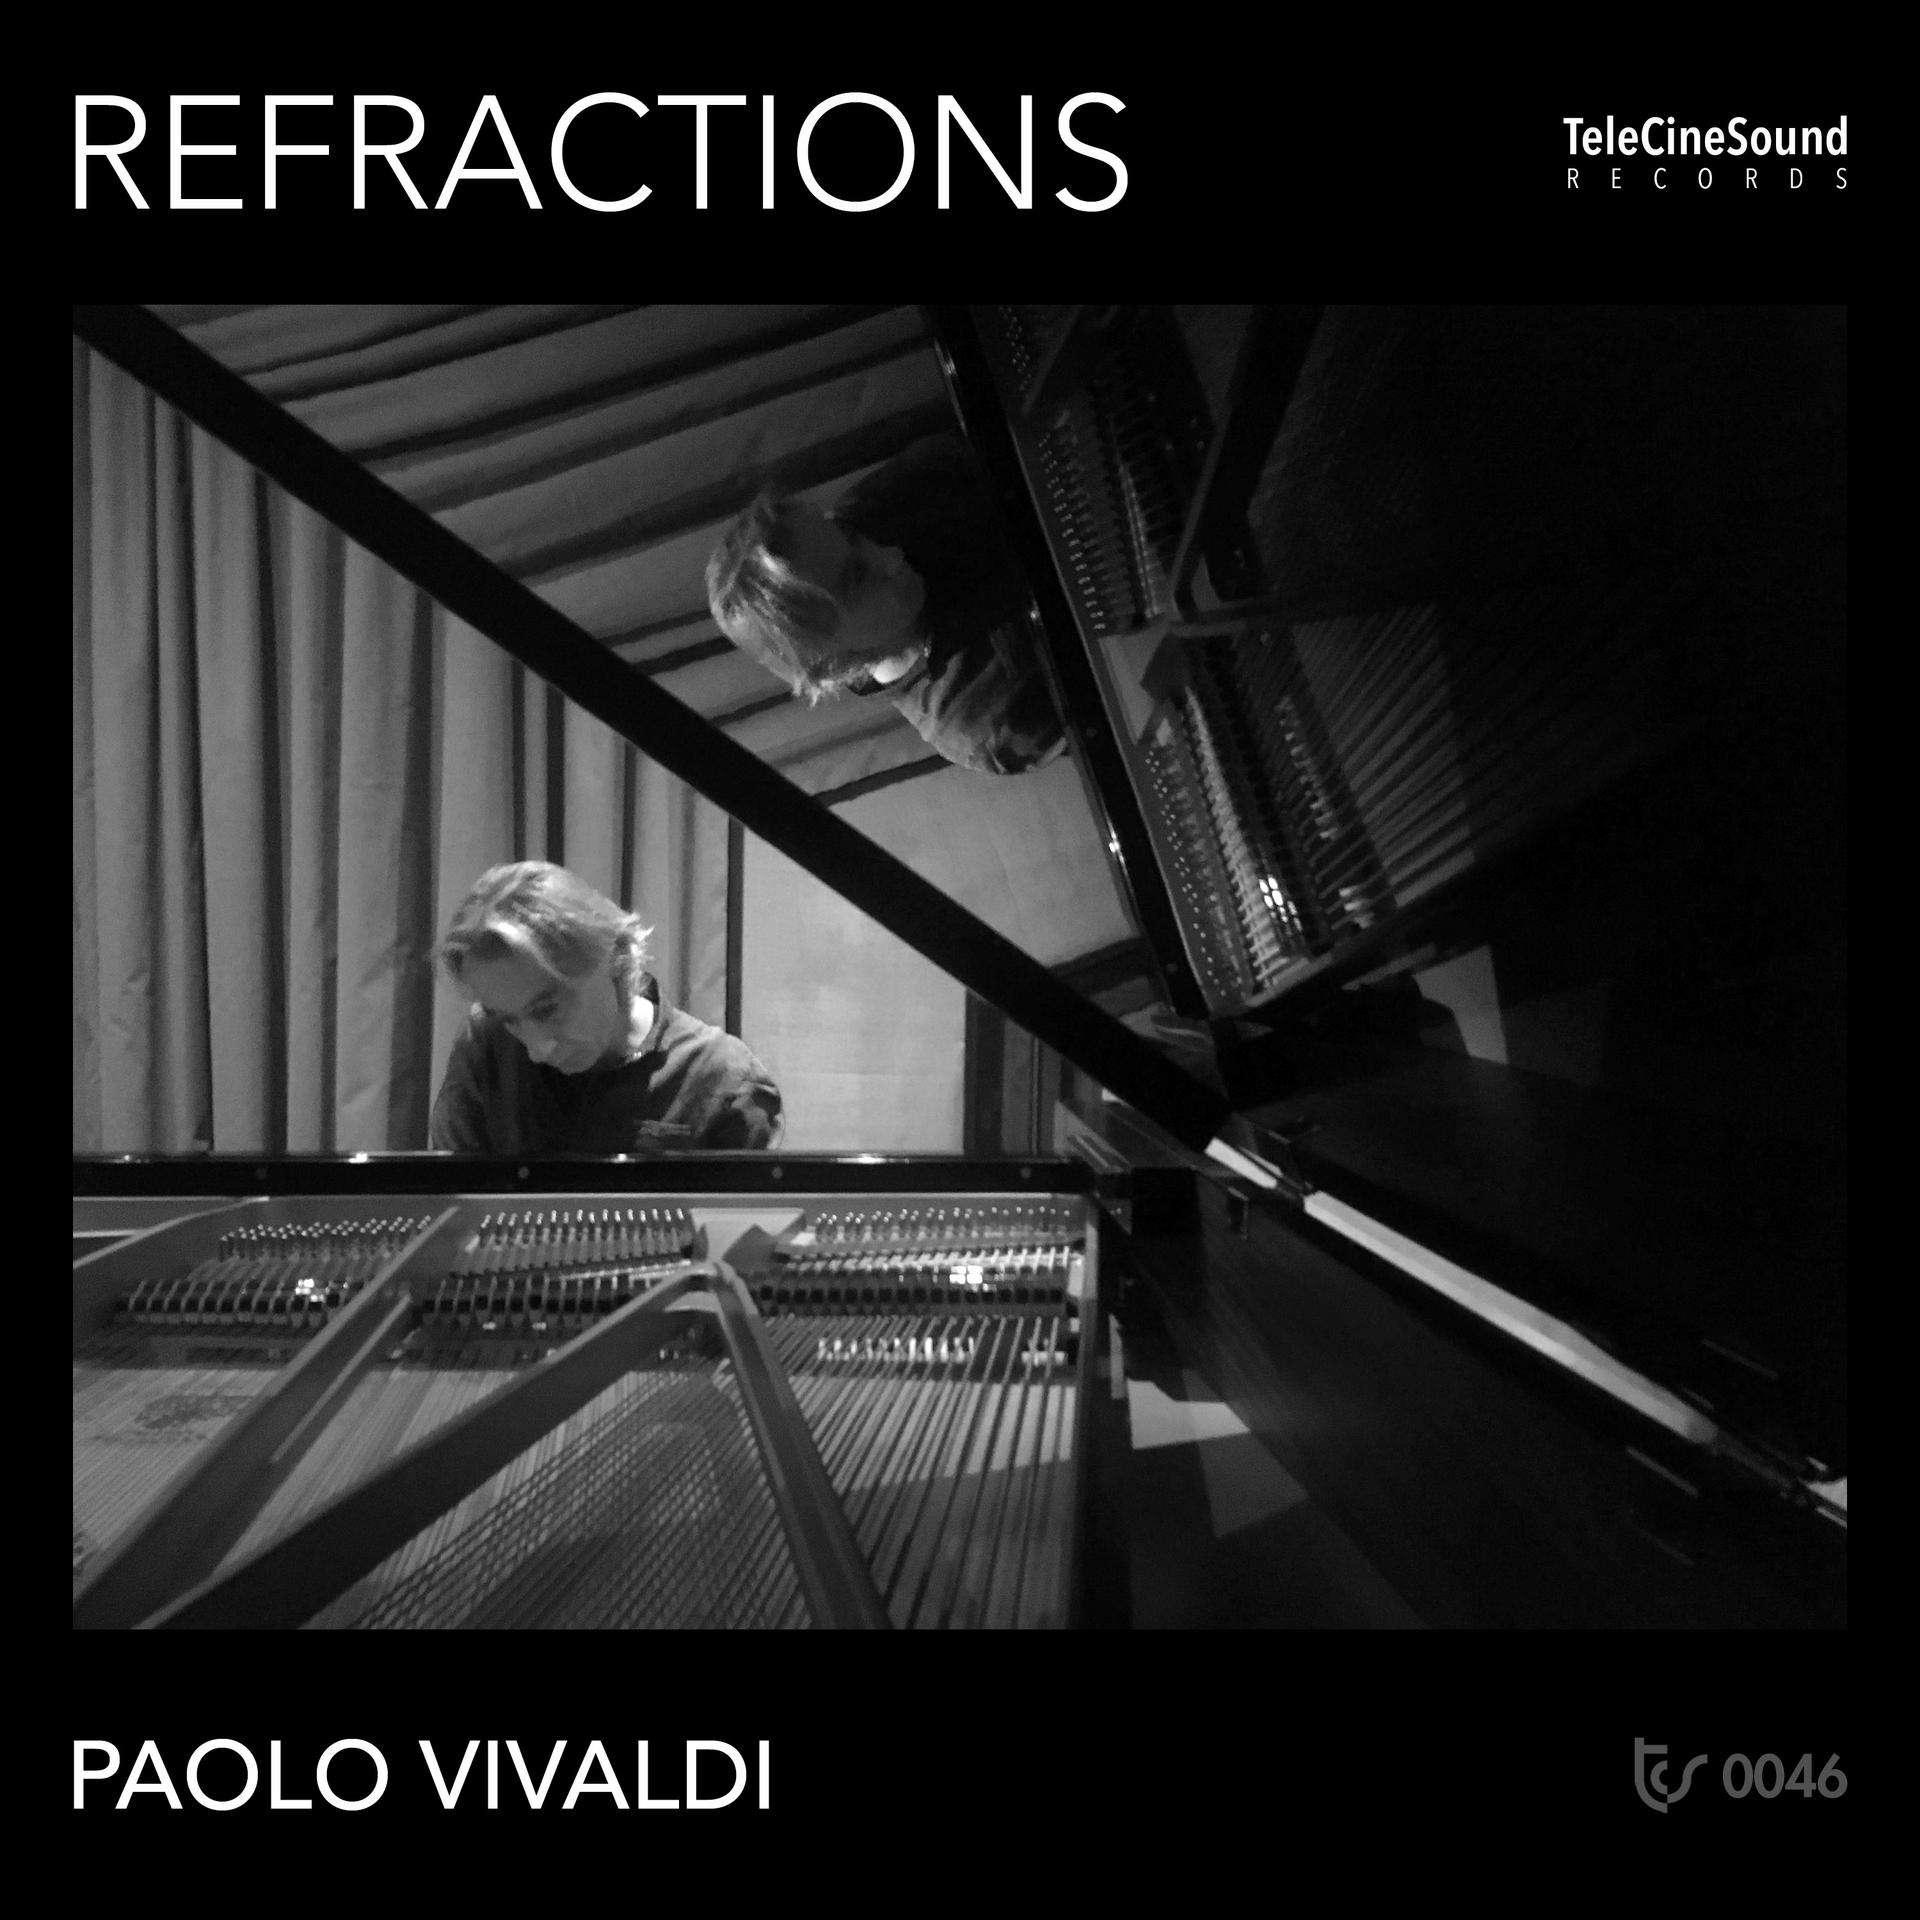 paolo vivaldi refractions